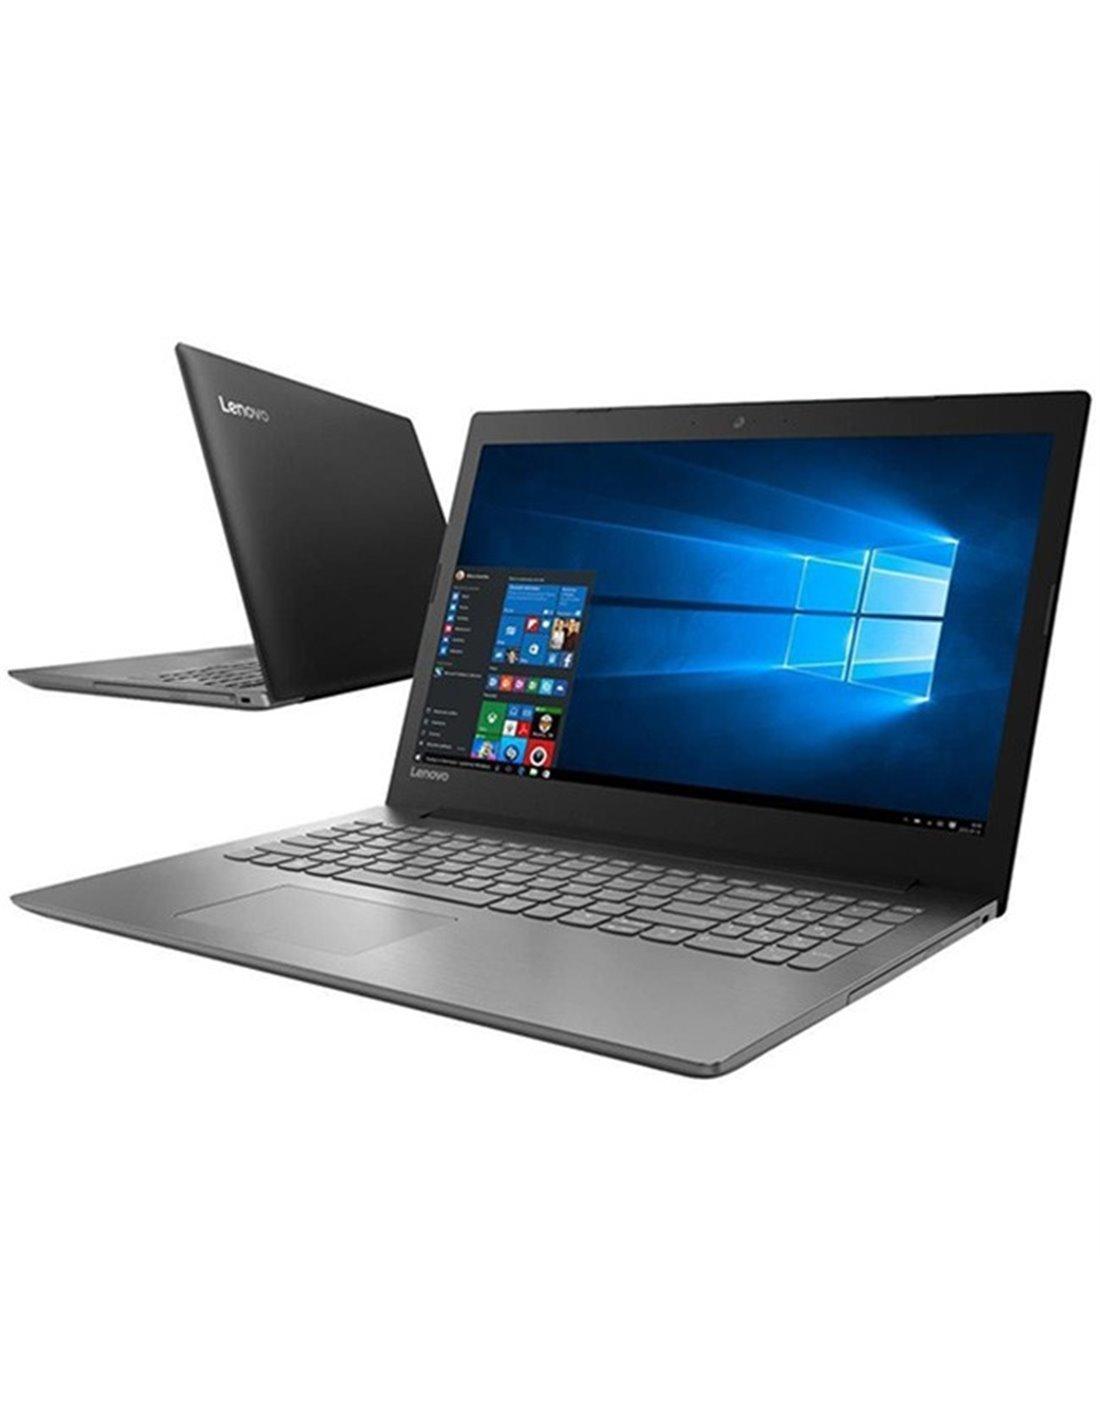 Dell NB Inspiron 5570 - Gjergji Kompjuter